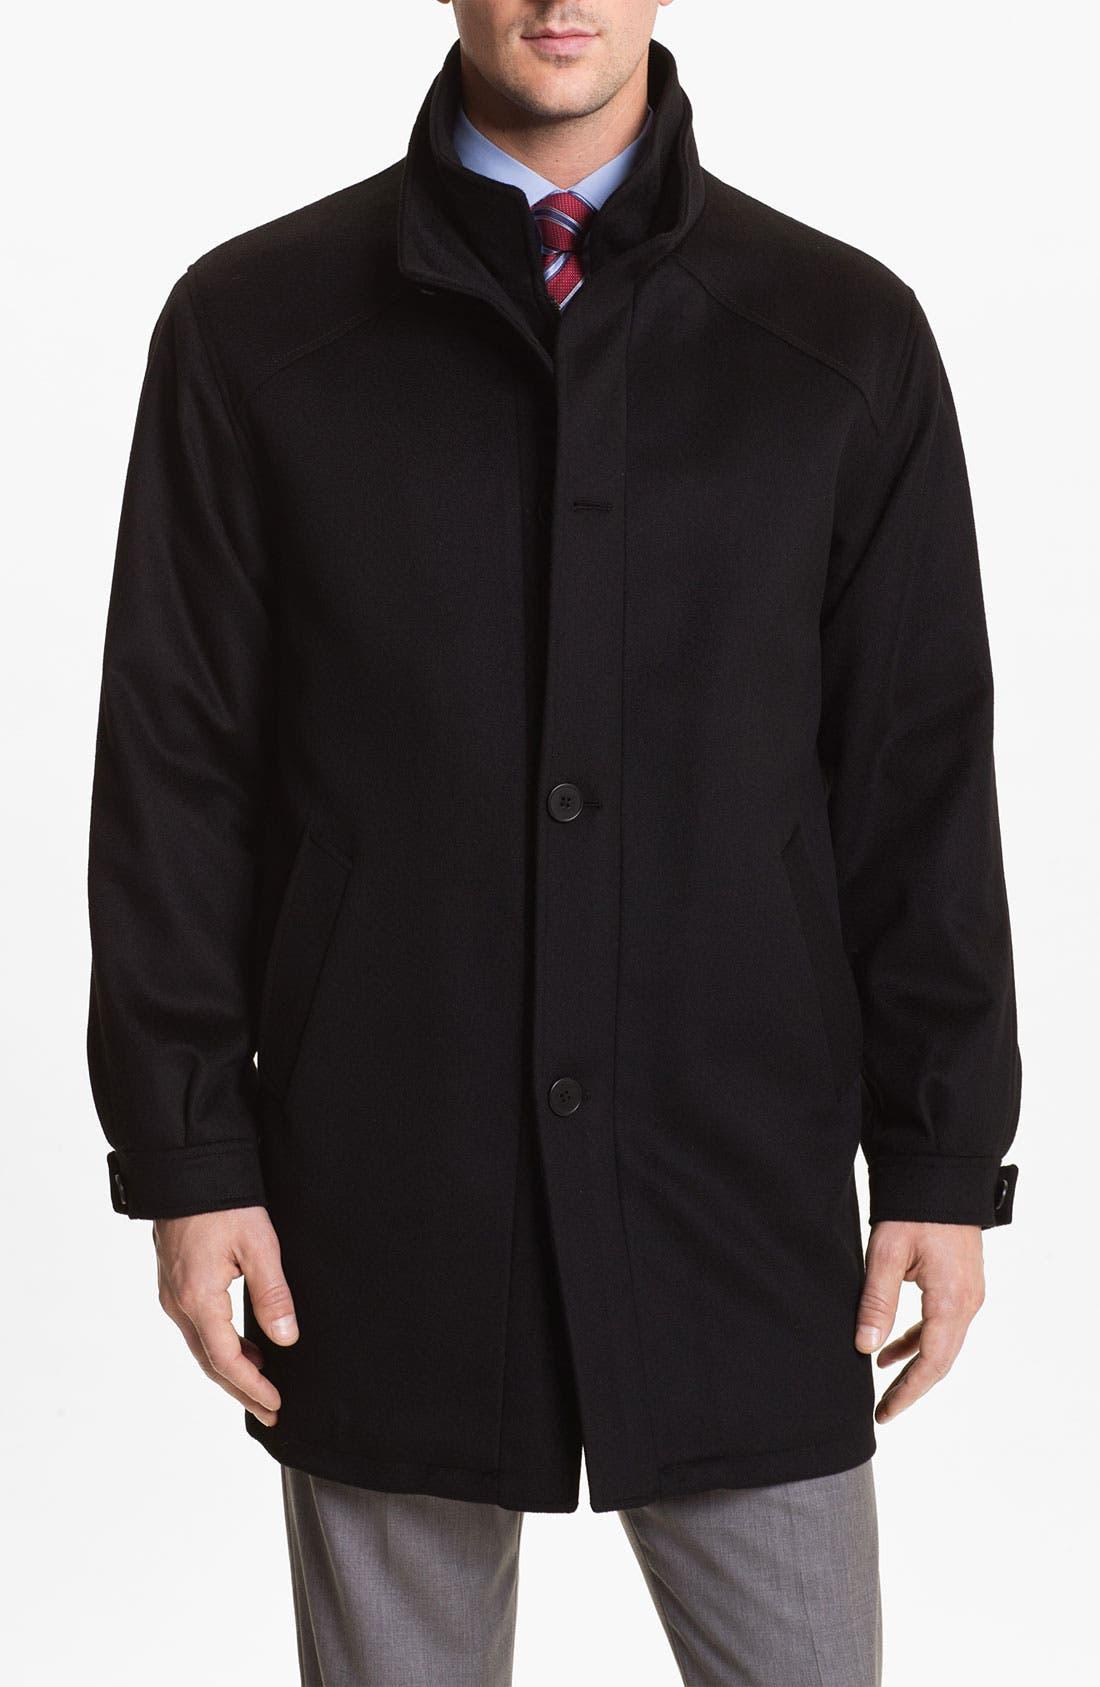 Alternate Image 1 Selected - Cardinal of Canada Wool Blend Car Coat